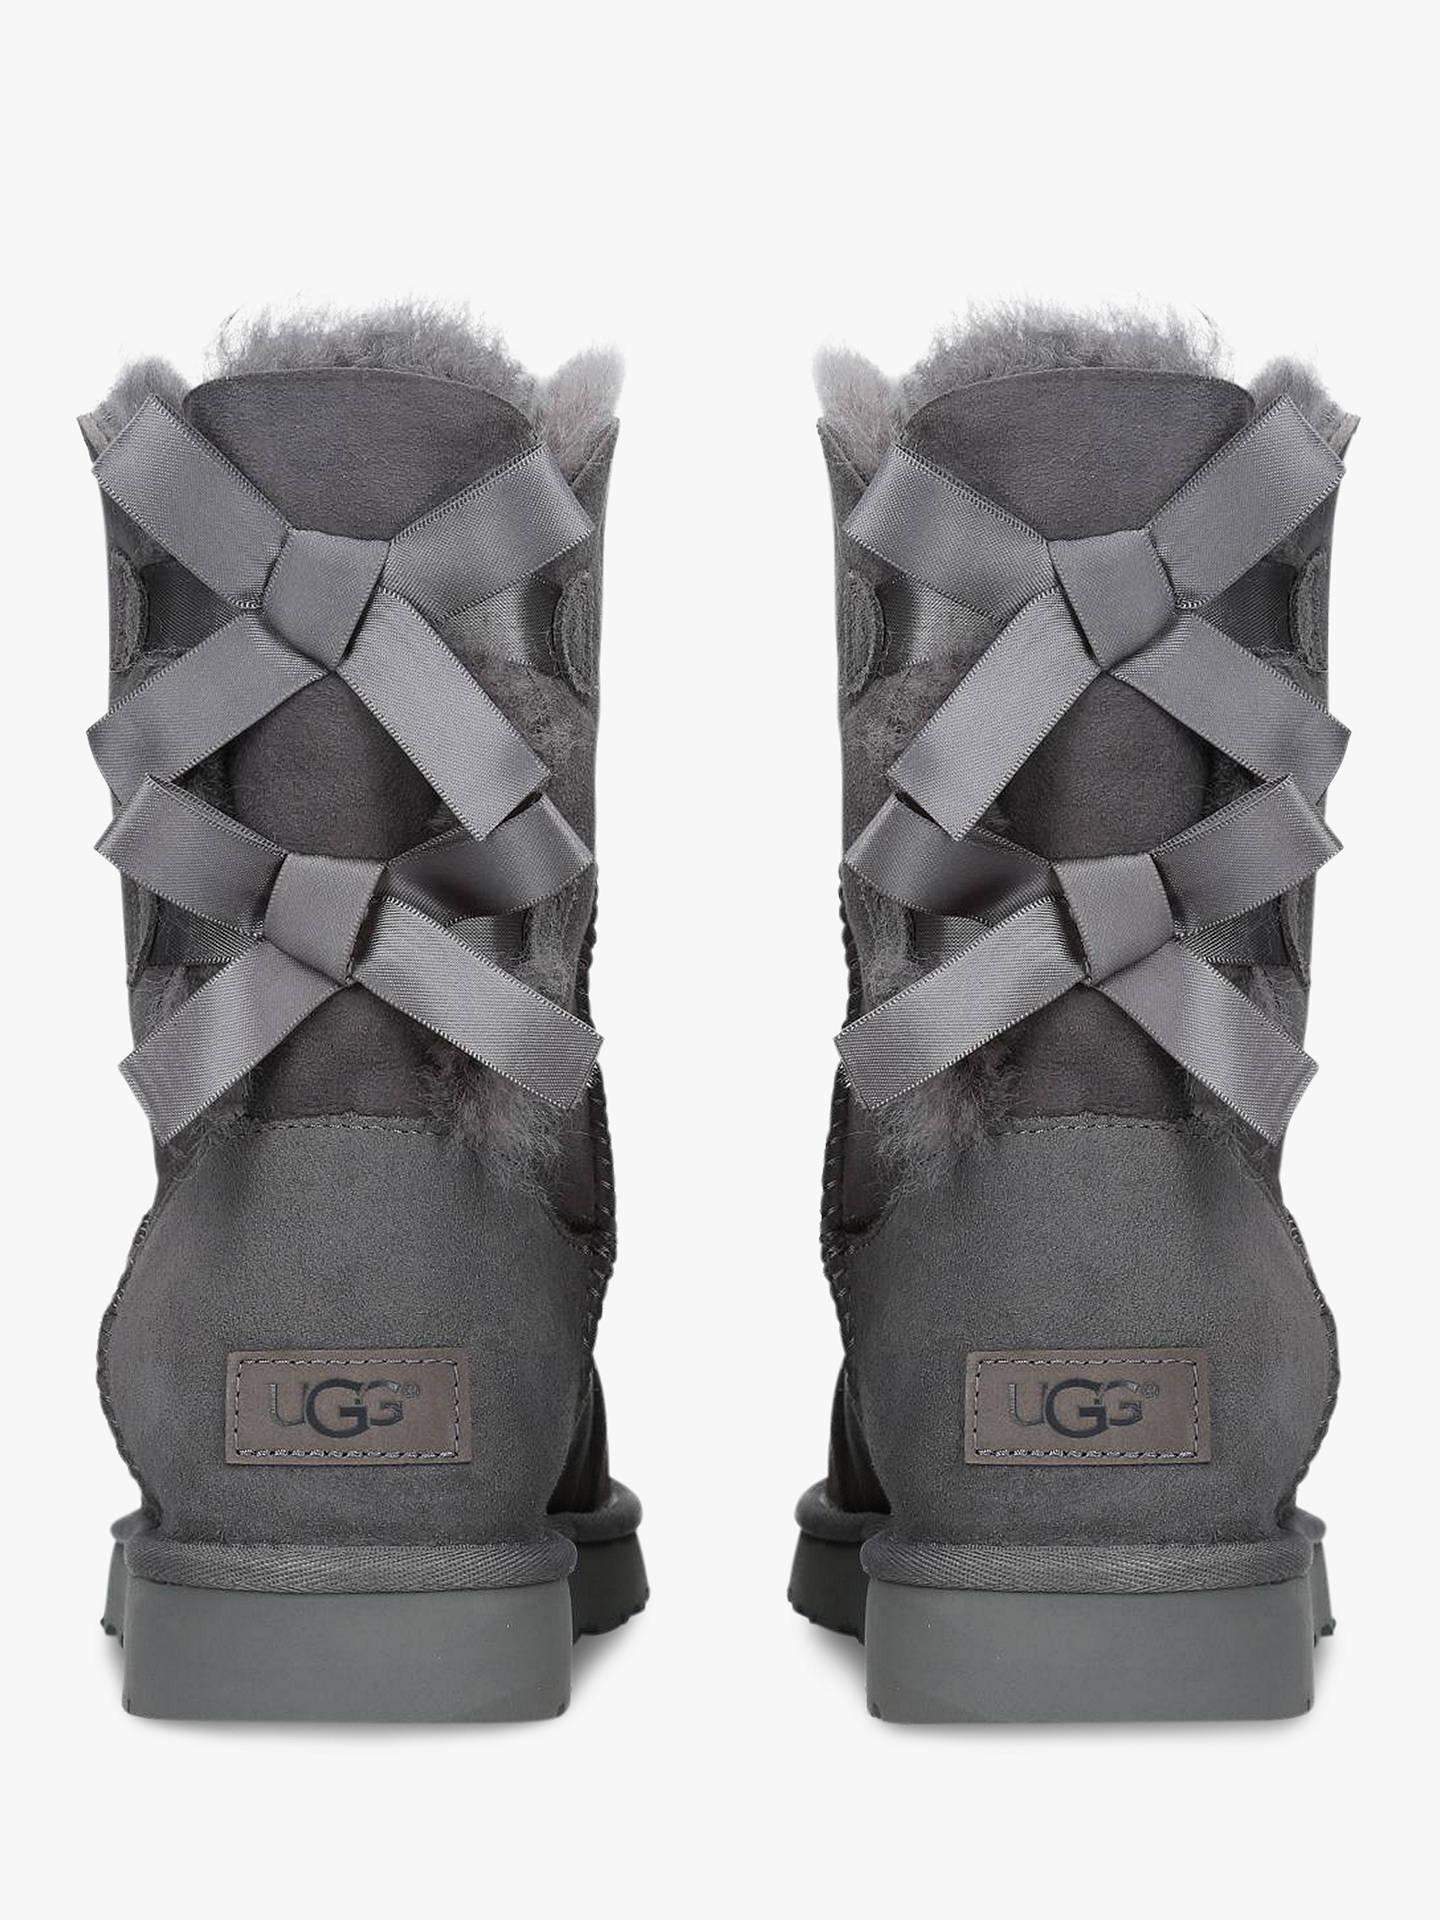 06adc753b11 UGG Bailey Bow Sheepskin Short Boots at John Lewis & Partners